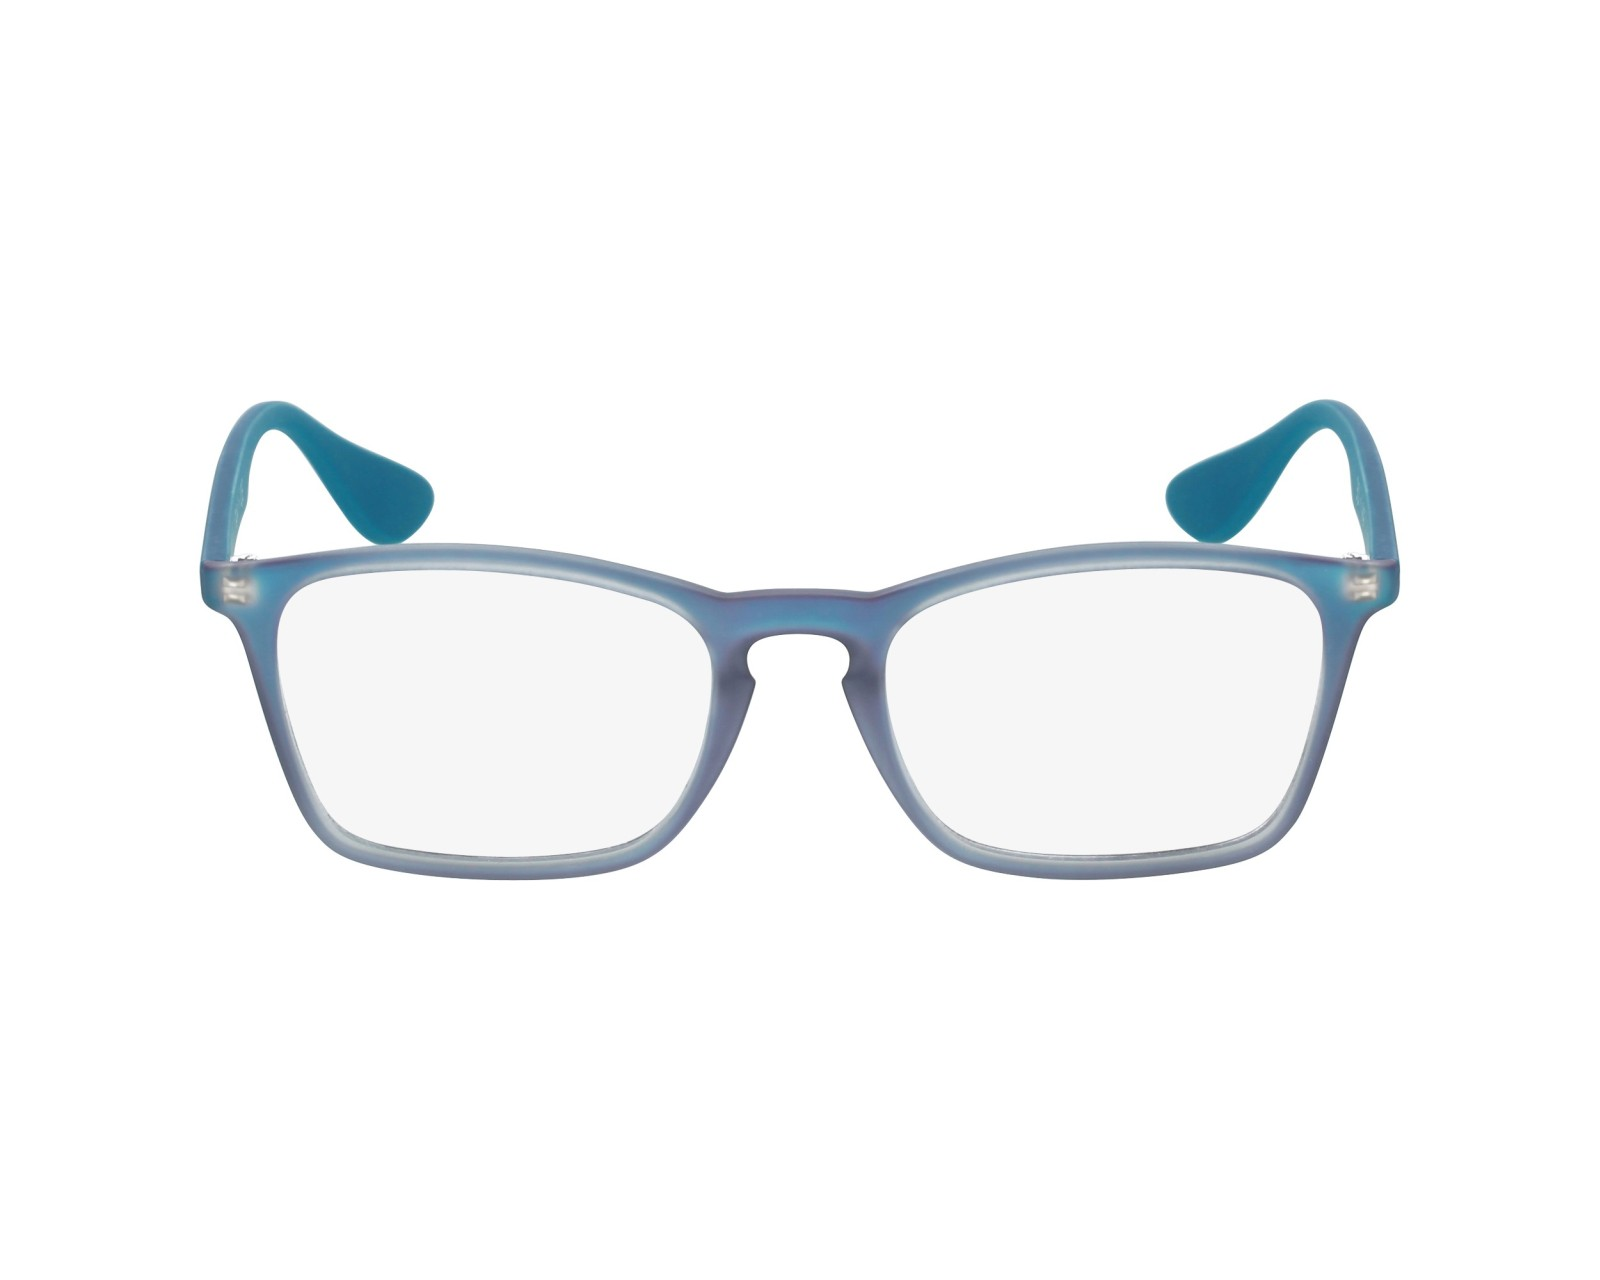 61a39188052 eyeglasses Ray-Ban RX-7045 5484 55-18 Blue profile view